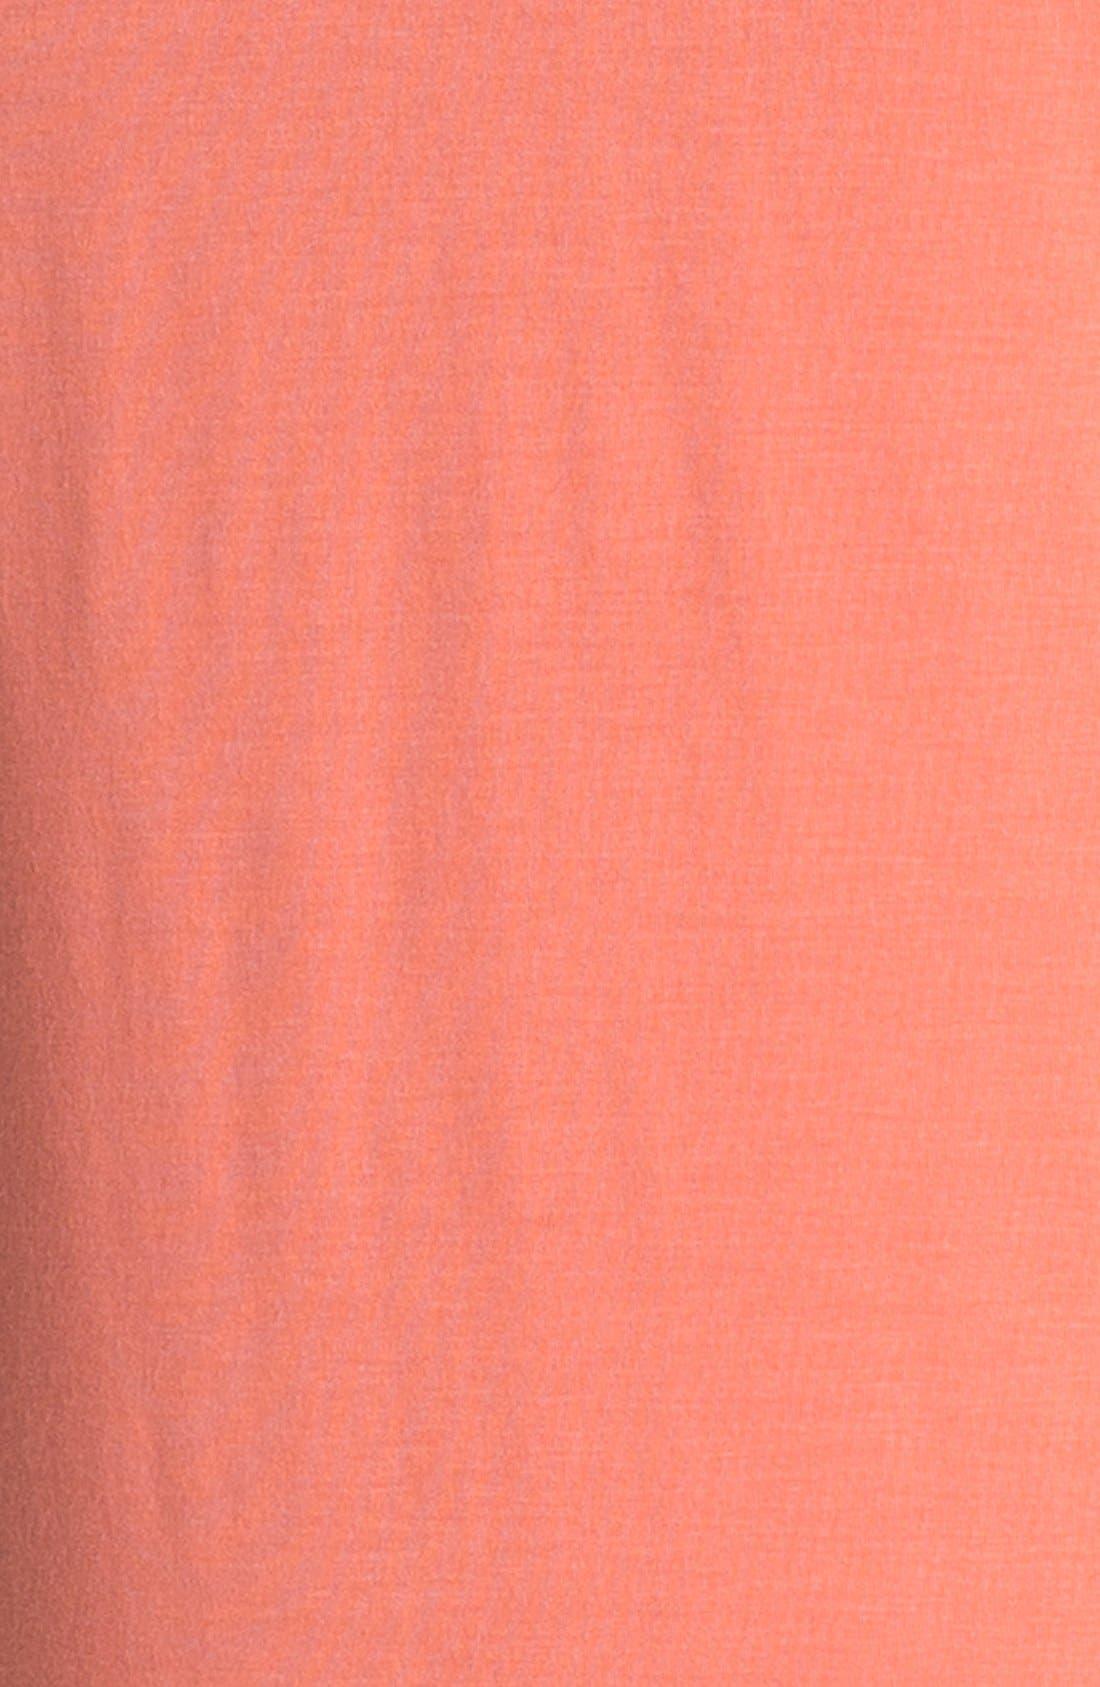 Alternate Image 3  - Isaac Mizrahi Jeans 'Morgan' V-Neck Tee